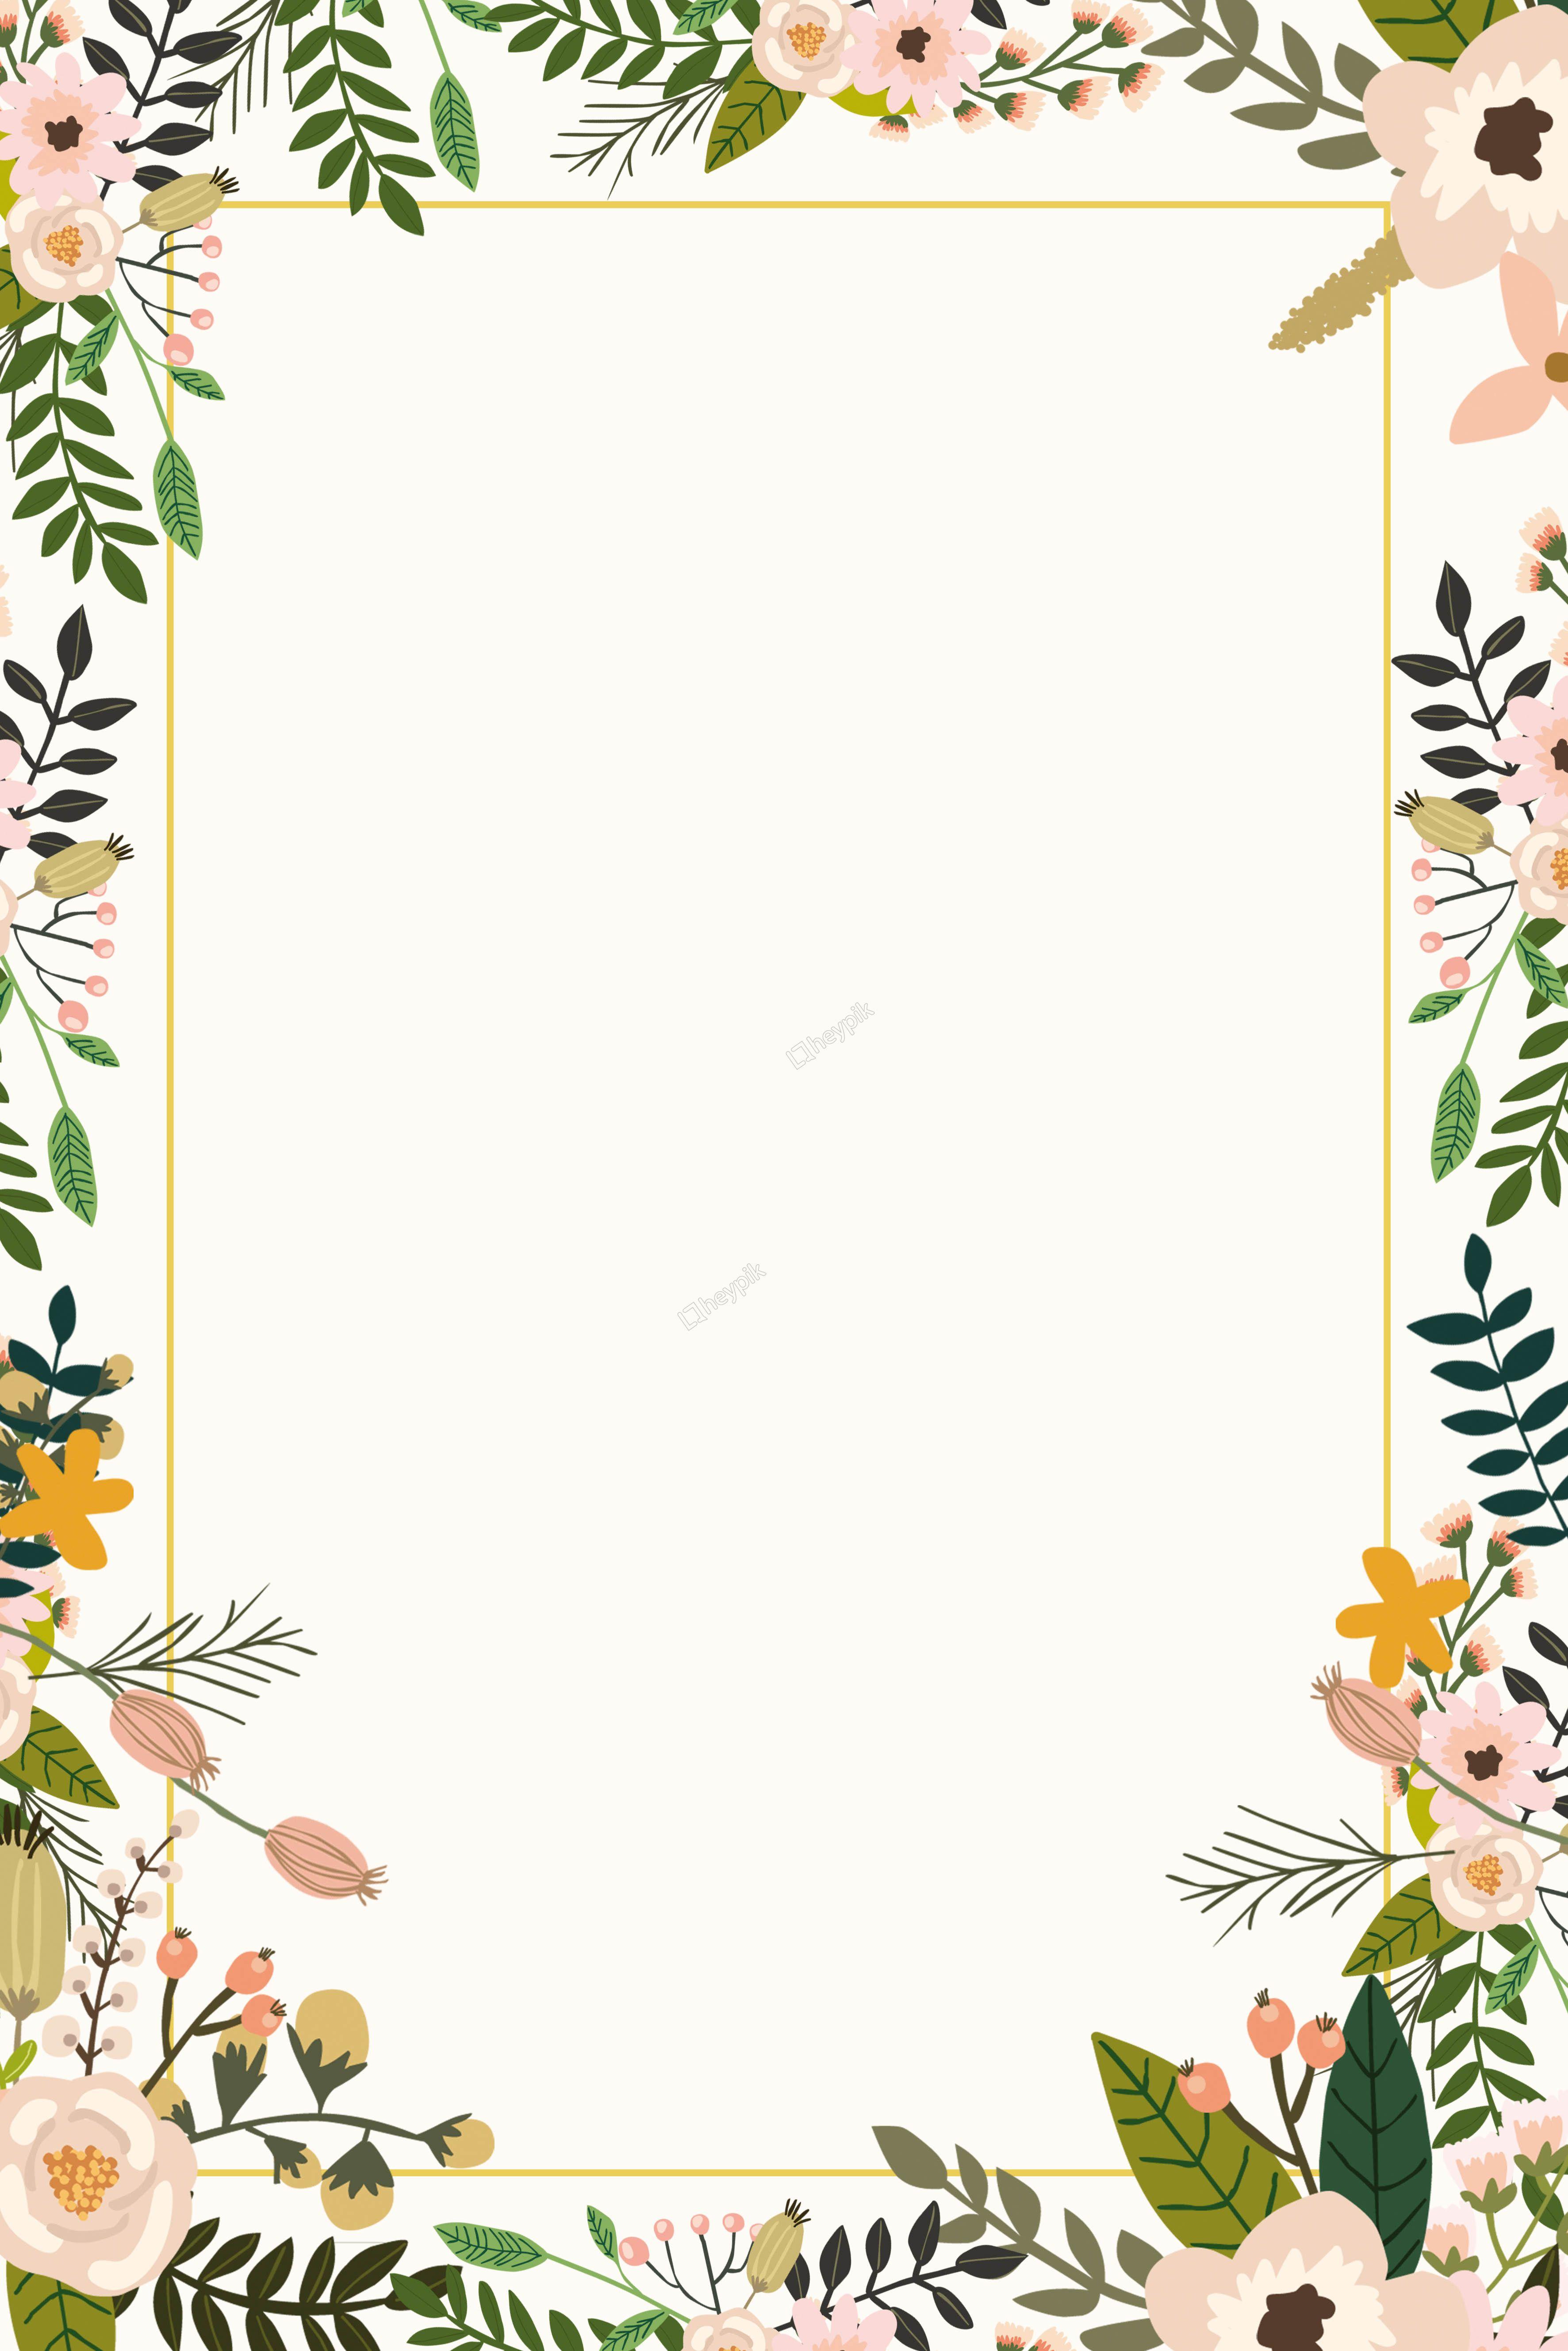 Color Plant Flower Border Background Poster Dengan Gambar